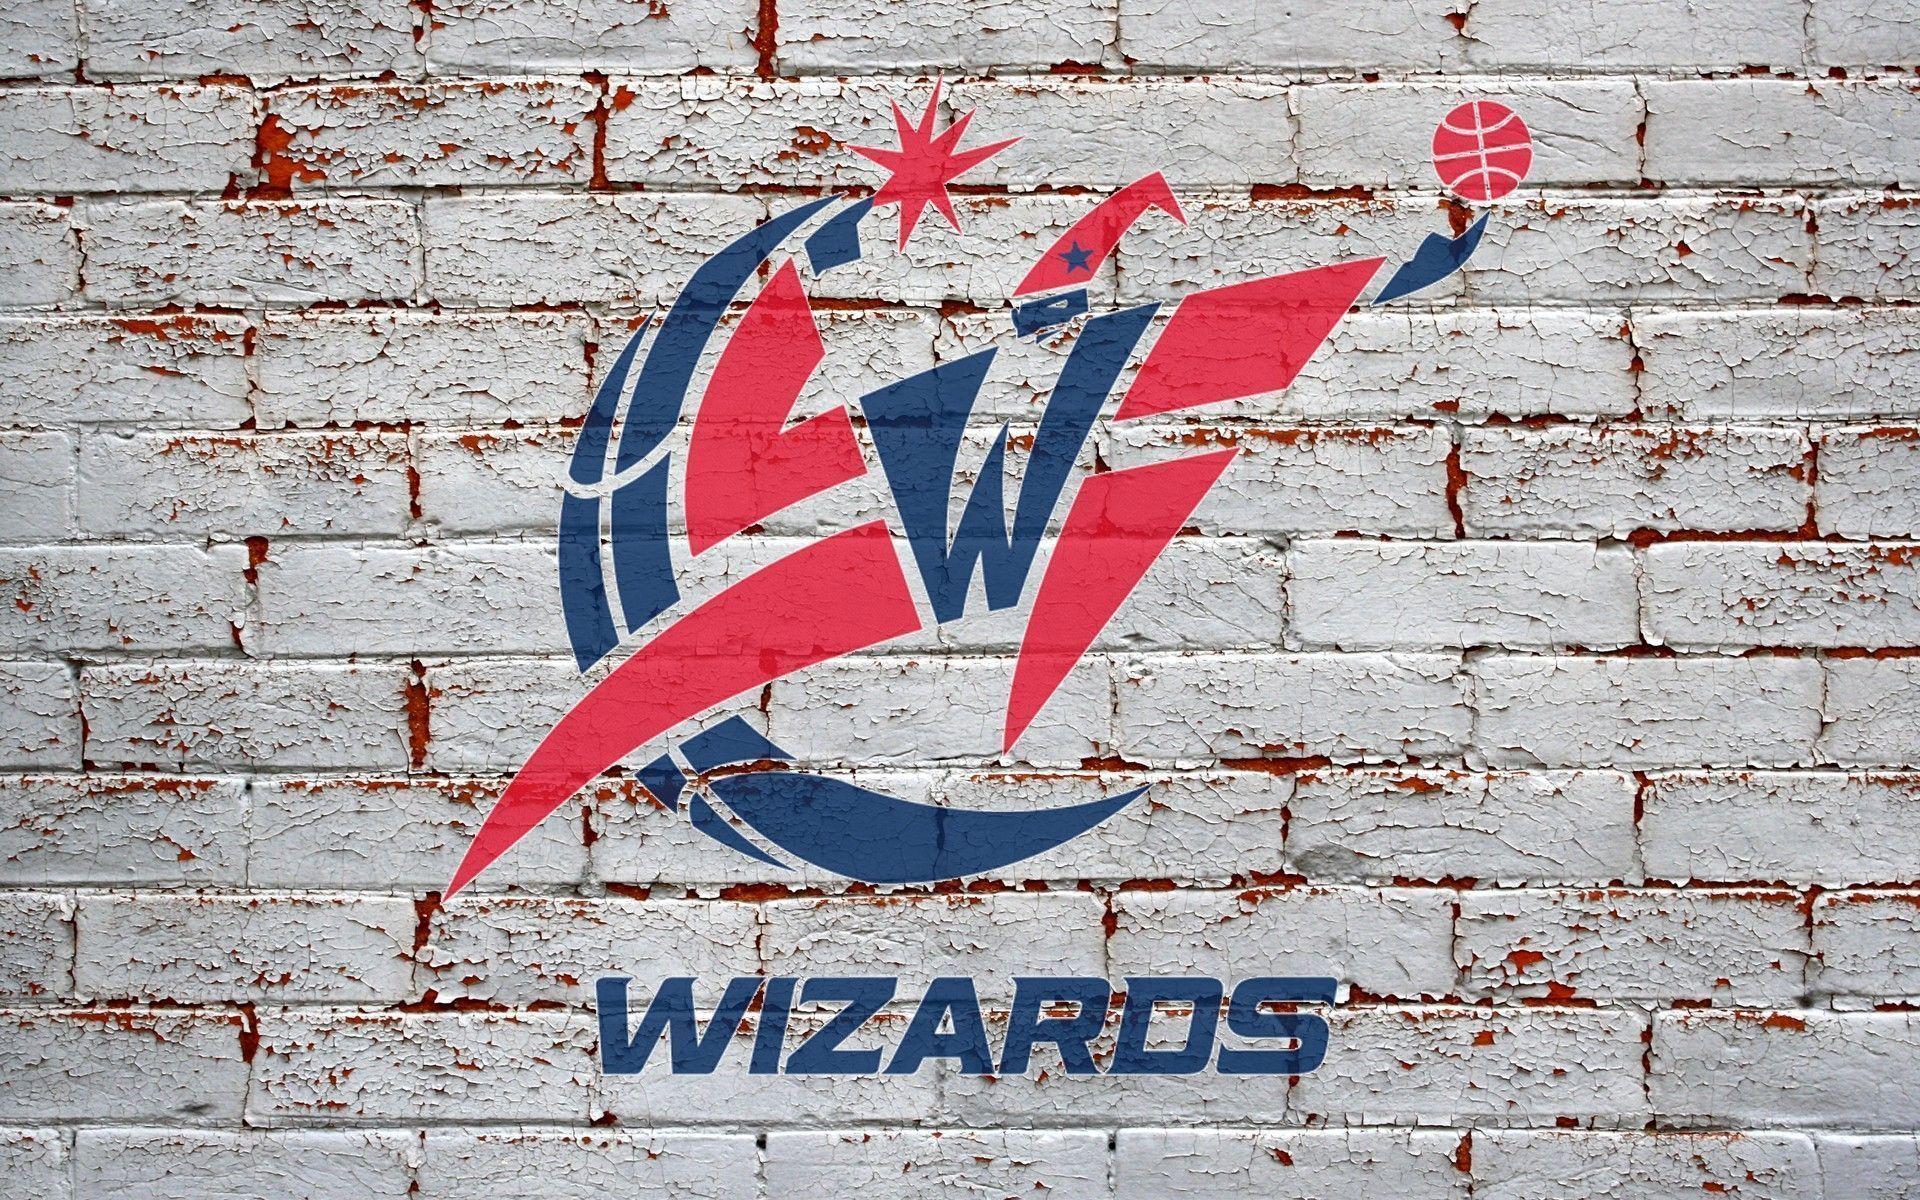 WASHINGTON WIZARDS nba basketball 23 wallpaper 1920x1200 226674 1920x1200